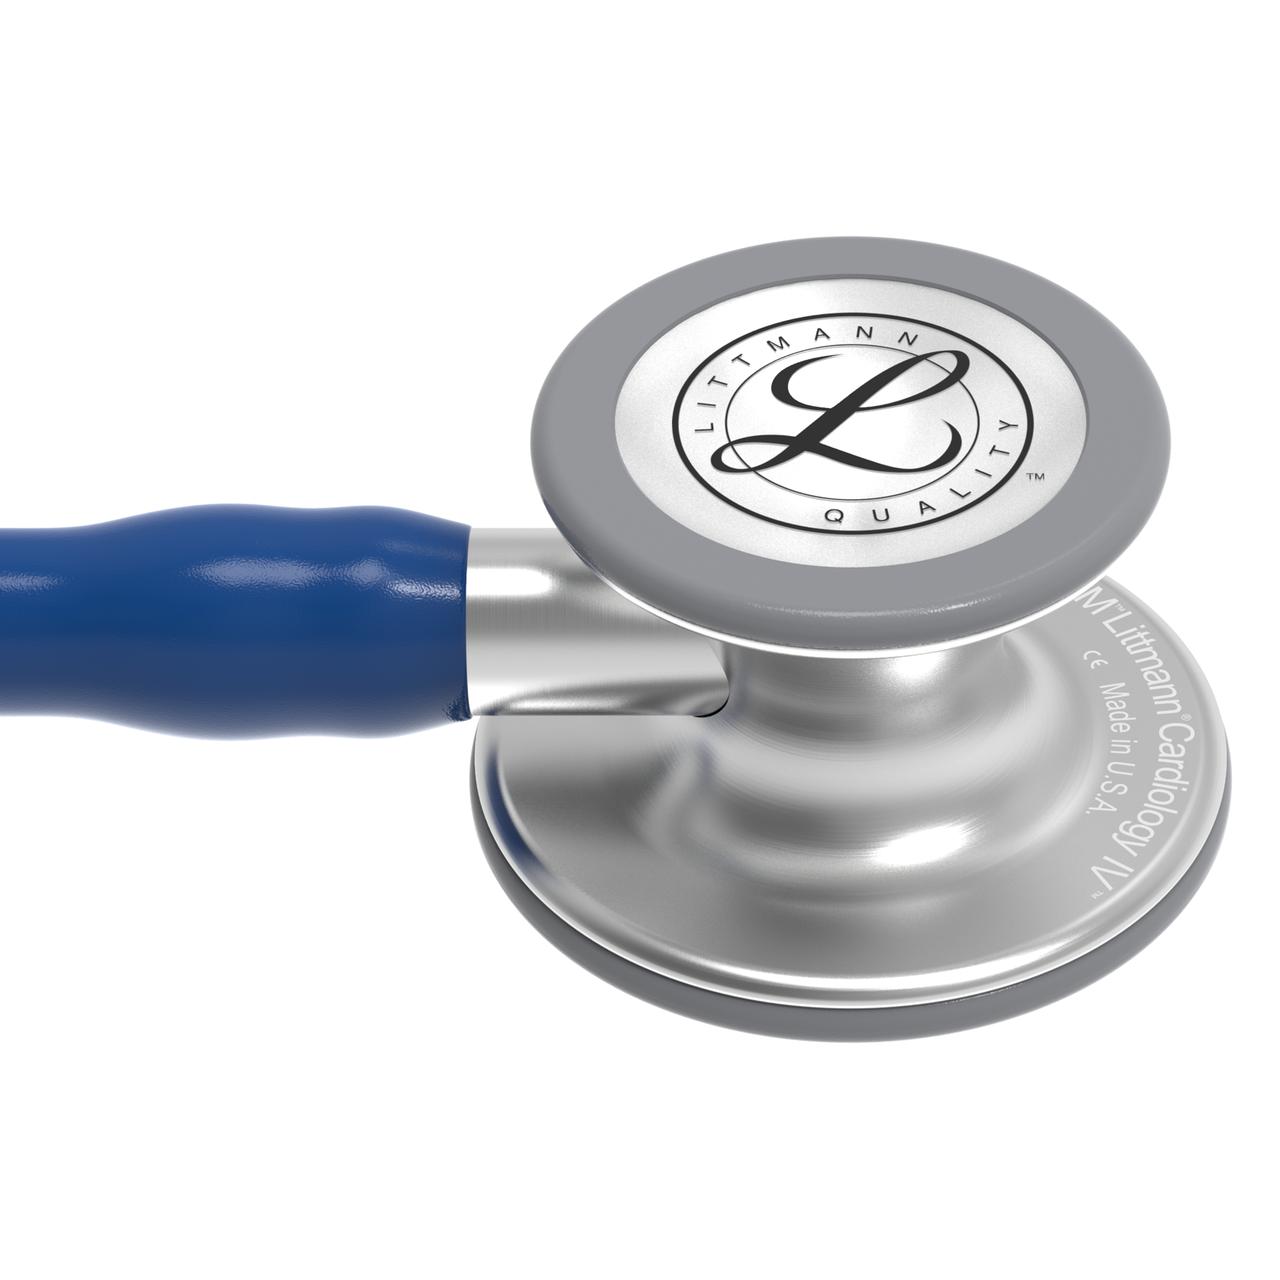 Littmann Cardiology IV Stethoscope, Navy, 6154